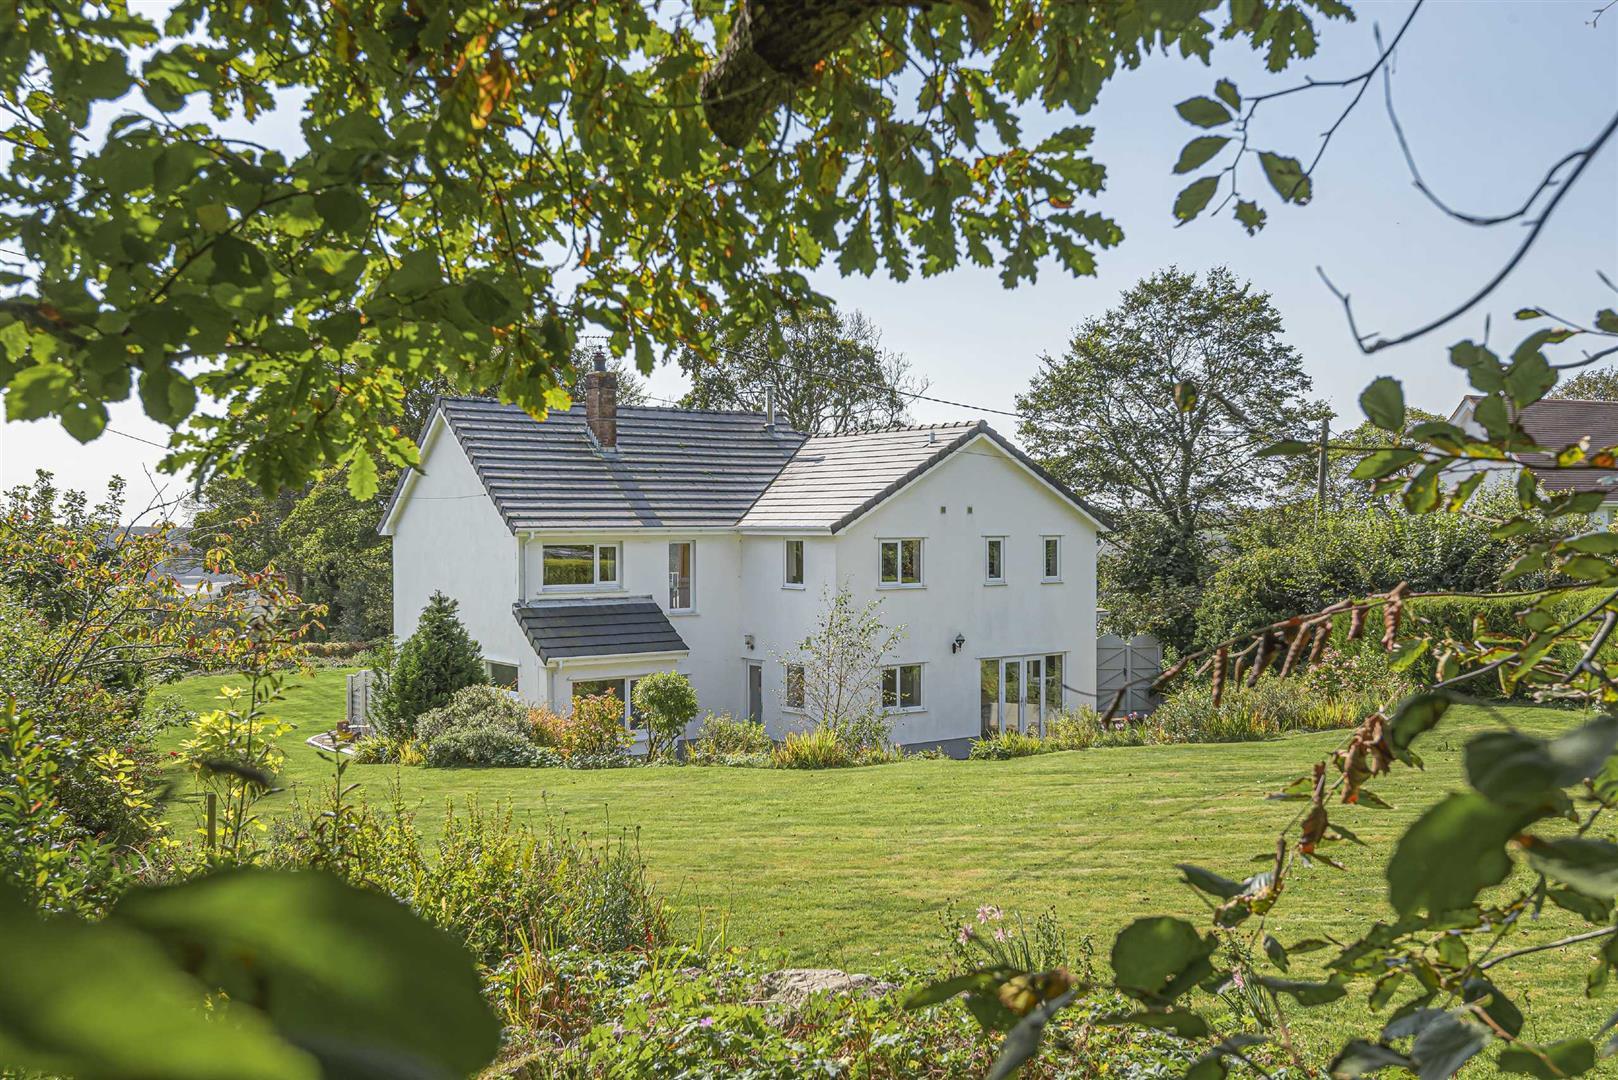 Hall Meadow, Nicholaston Penmaen, Swansea, SA3 2HL